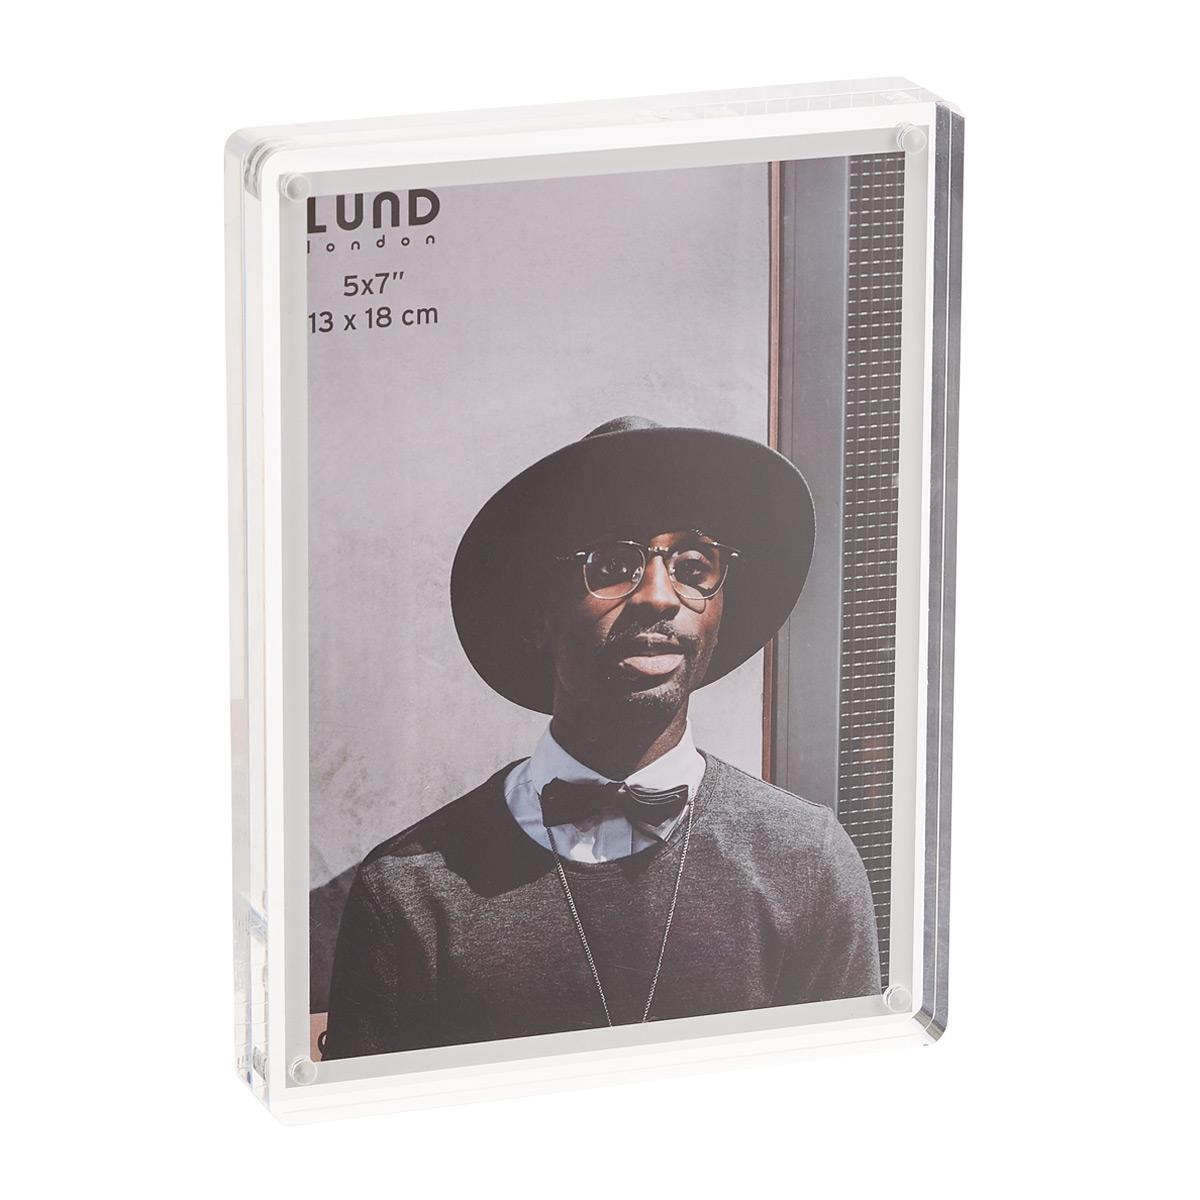 Lund London 5 x 7 Premium Acrylic Photo Frame